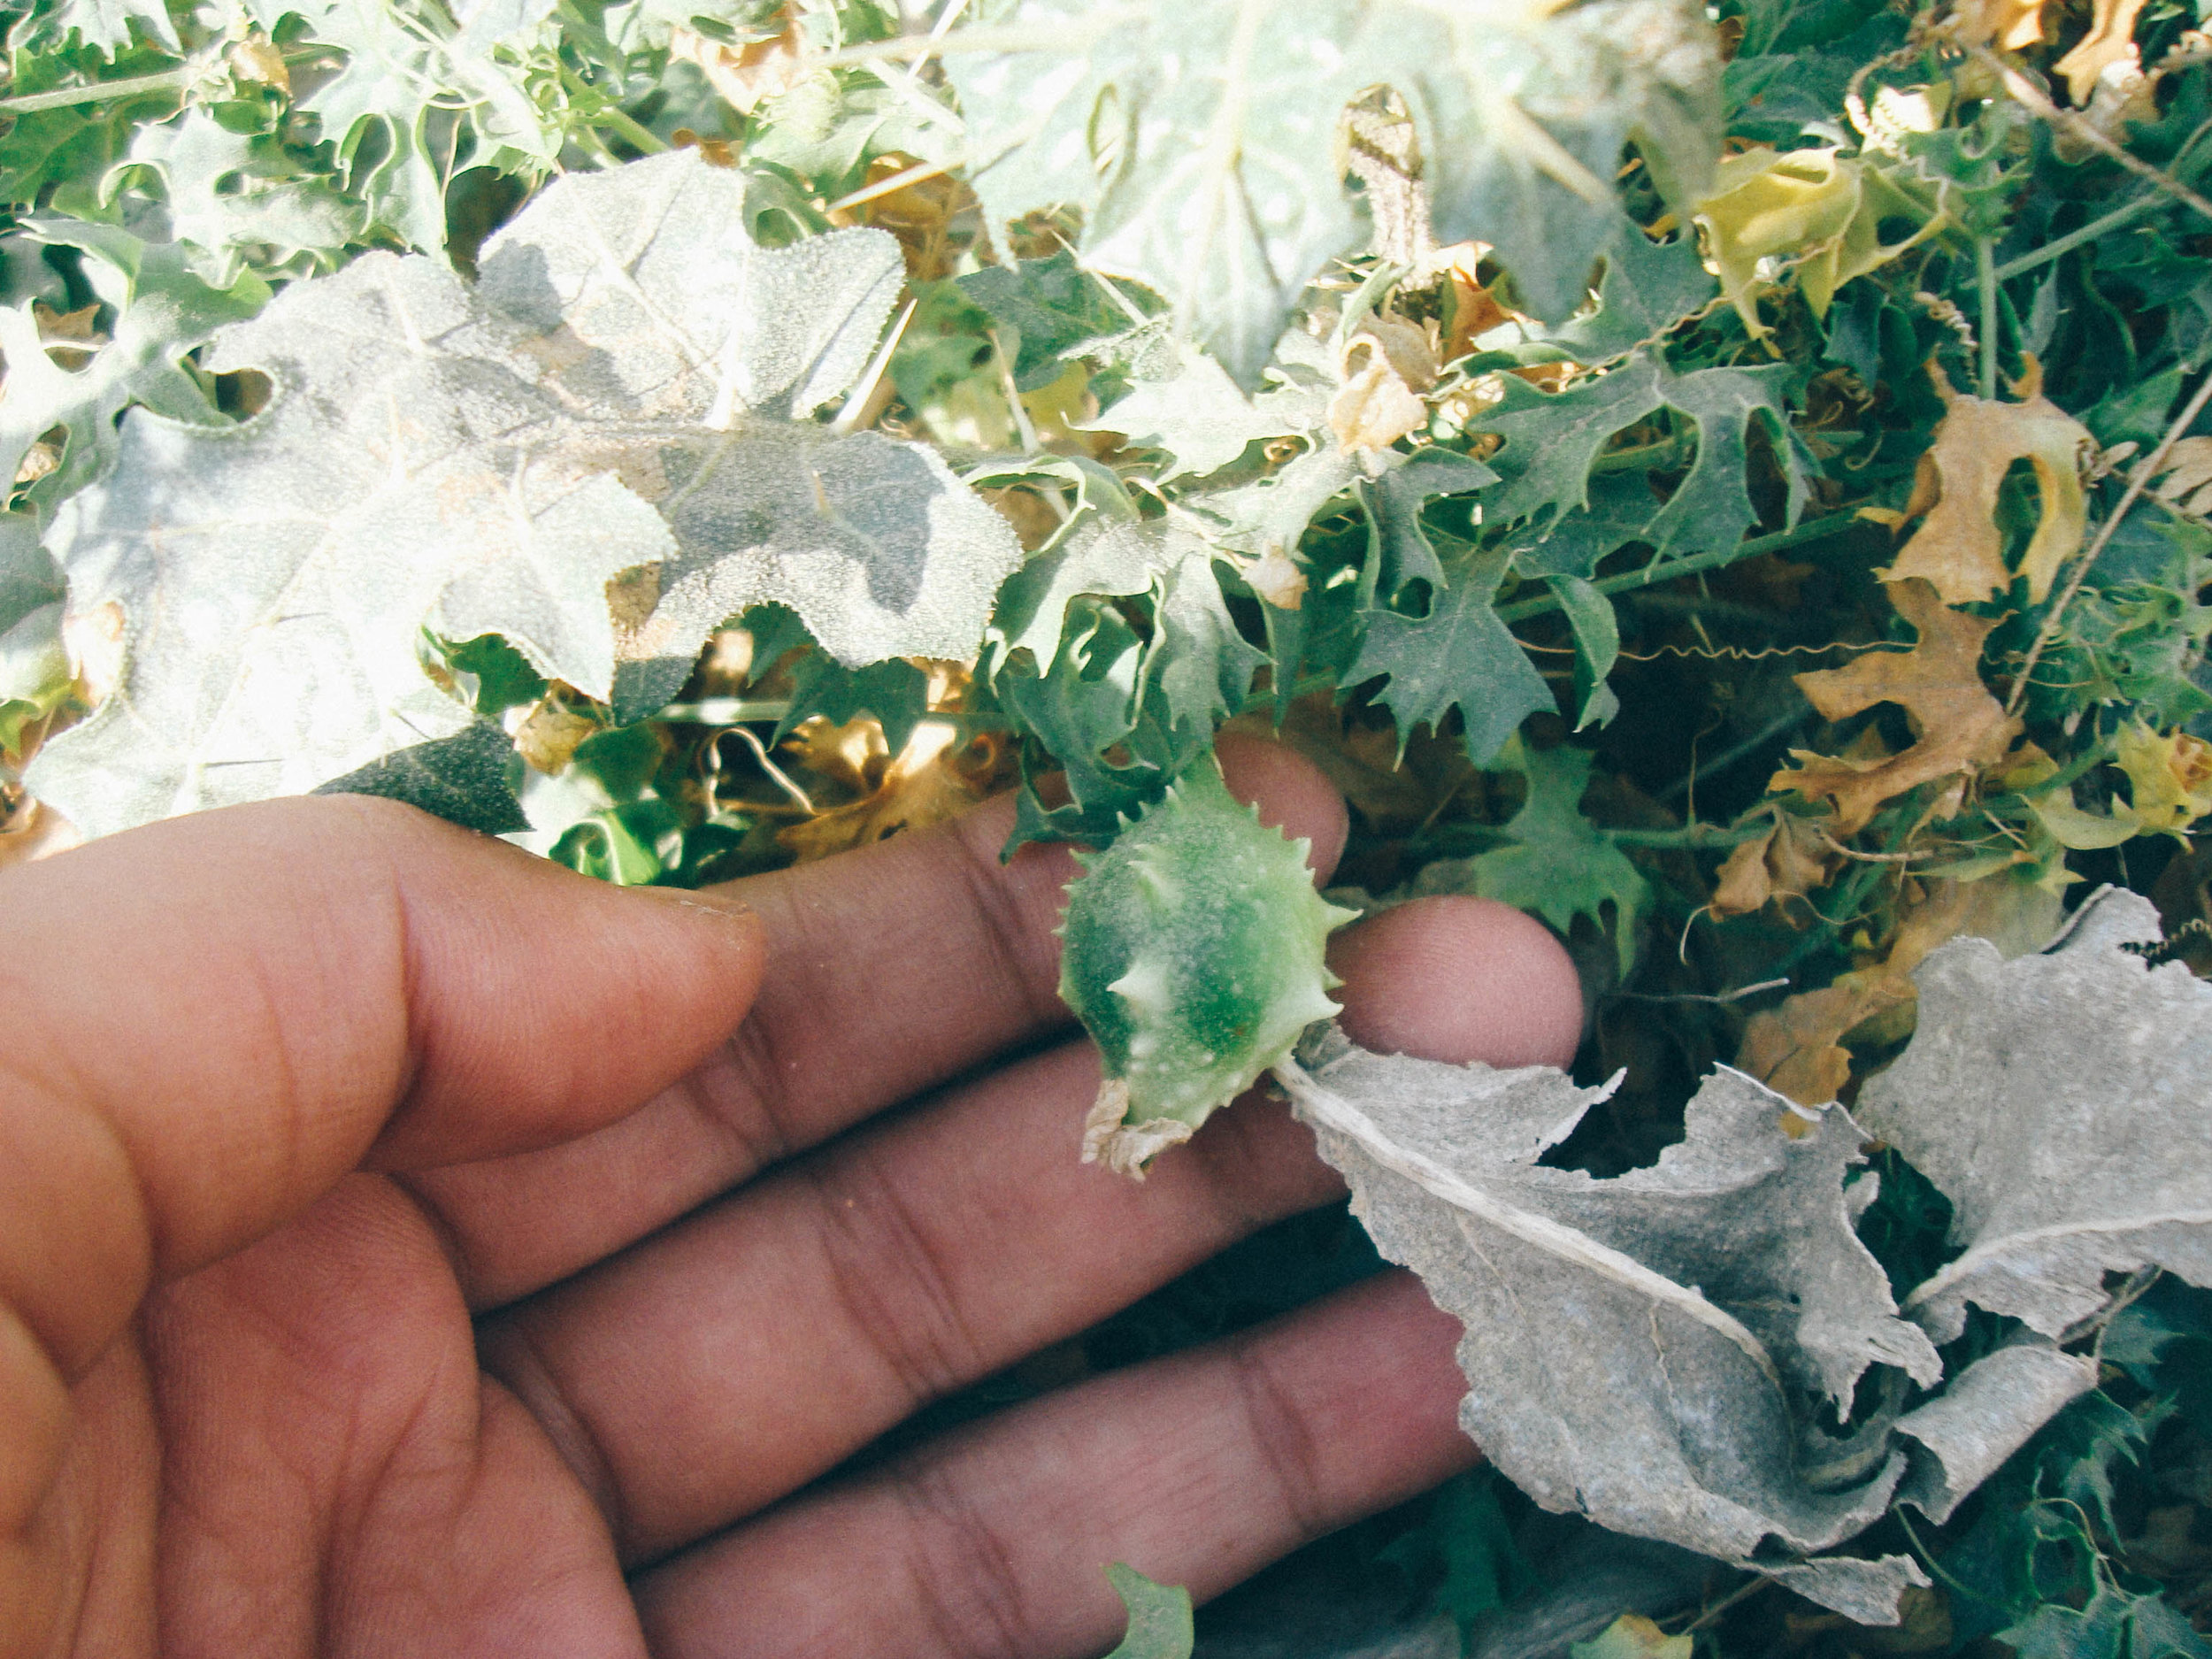 Wild Bitter Gourd (Jungli Karela) found in Kutch